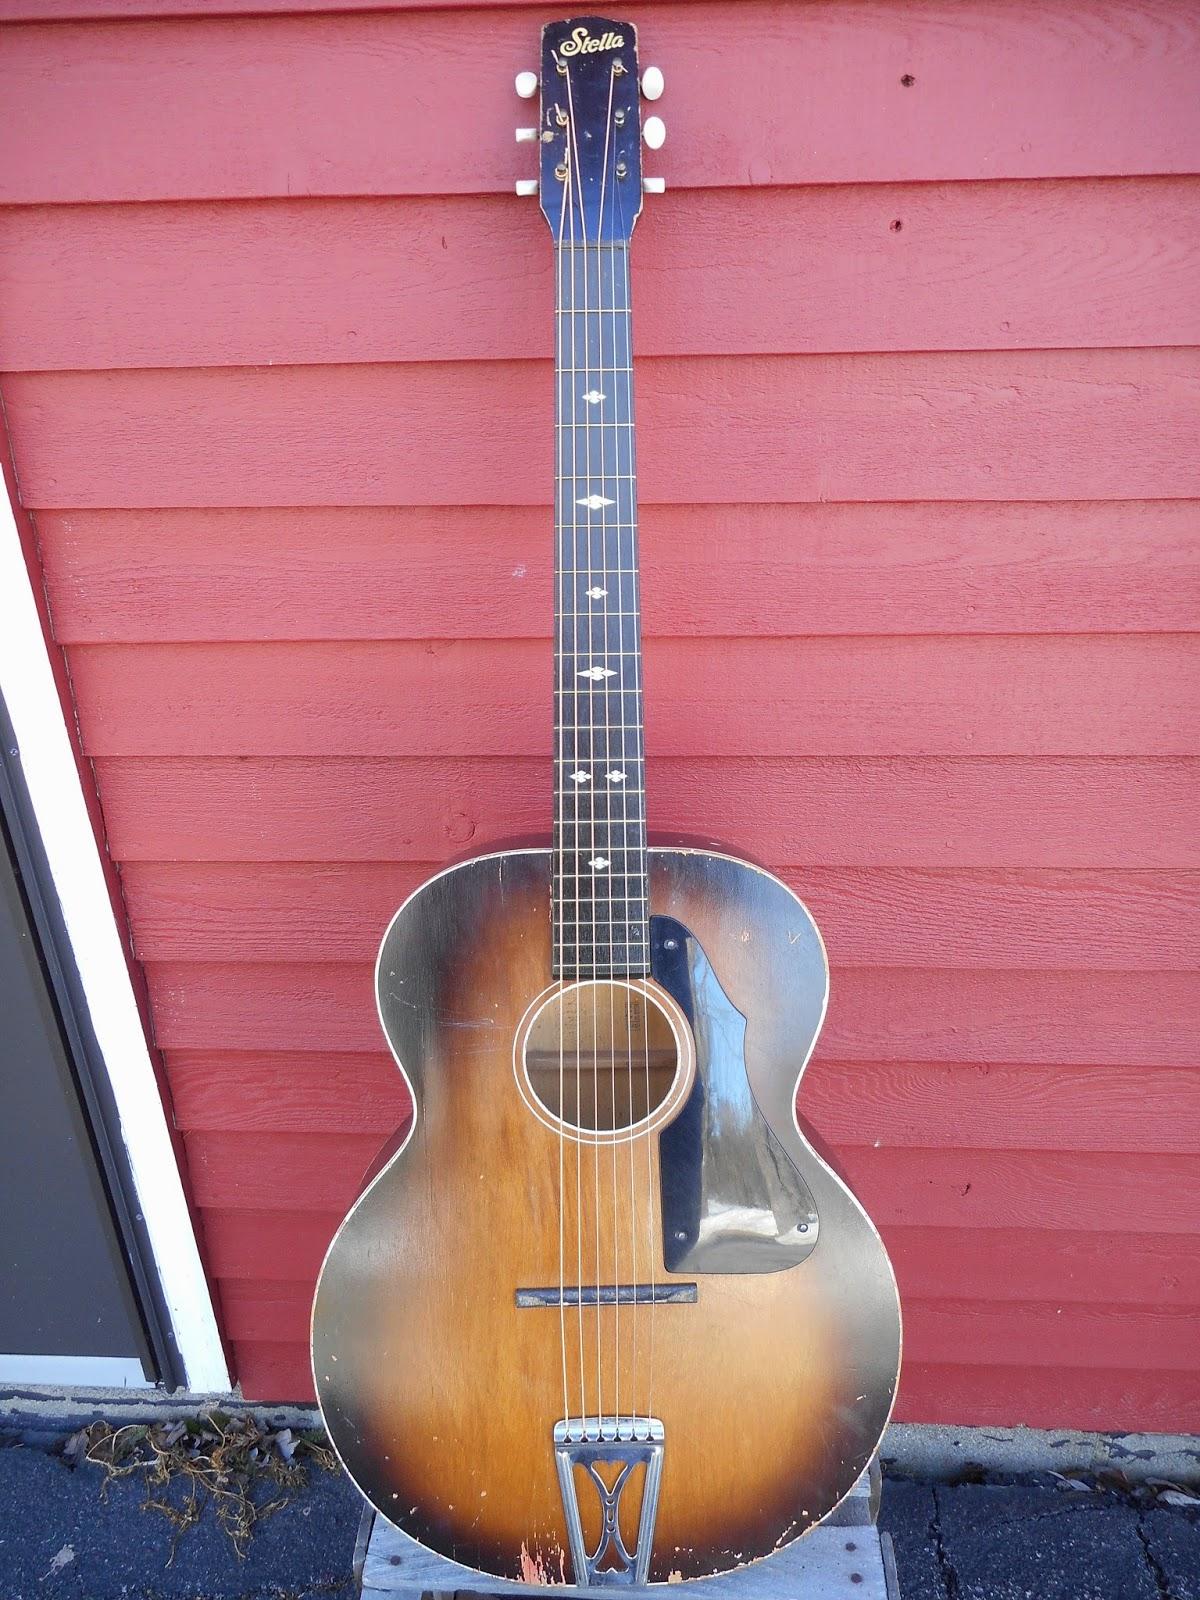 your grandpa 39 s guitar stella harmony h1105 grand concert acoustic guitar. Black Bedroom Furniture Sets. Home Design Ideas